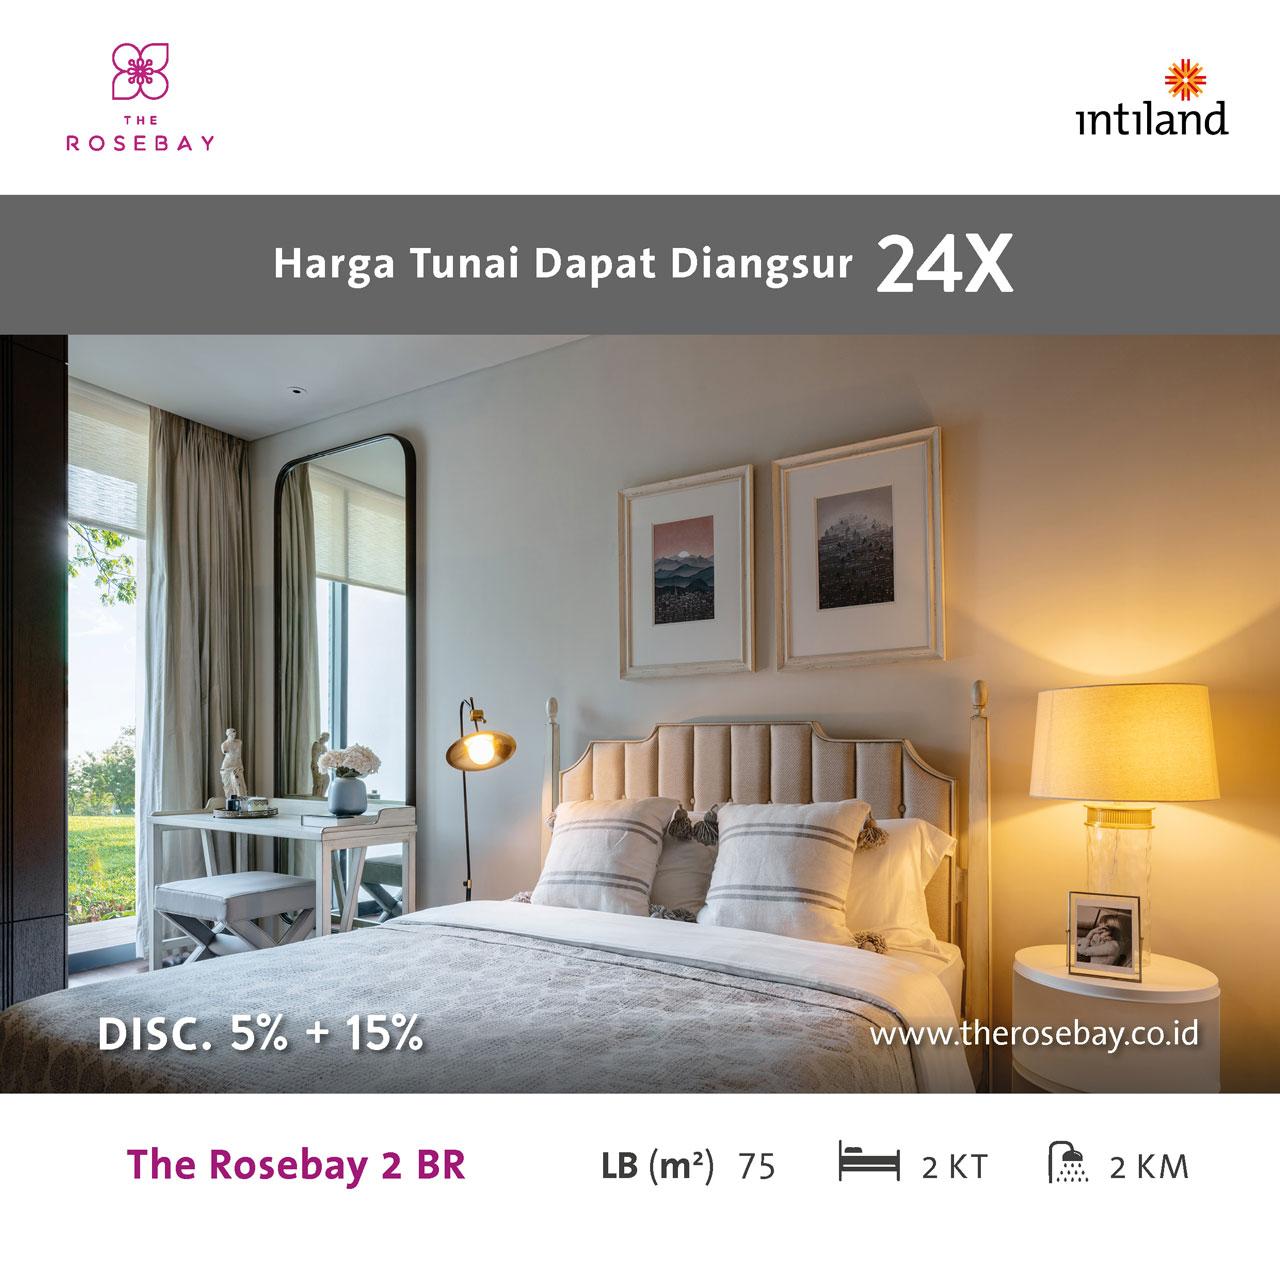 the-rosebay-special-offer